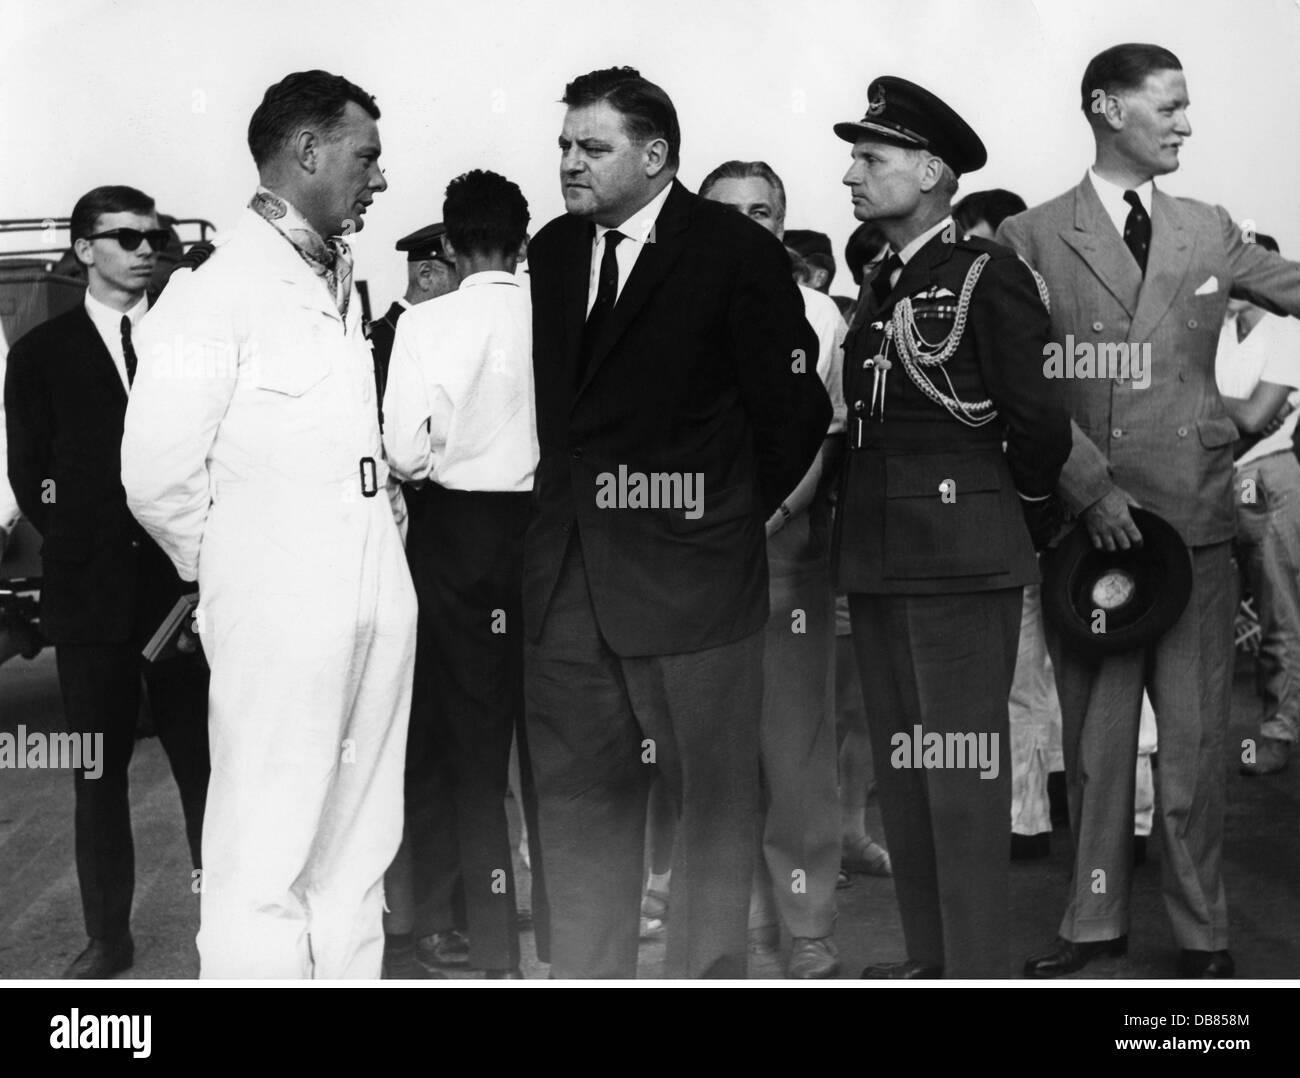 Strauss, Franz Josef, 6.9.1915 - 3.10.1988, German politician (CSU), Federal Minister of Defence 16.10.1956 - 9.1.1963, - Stock Image